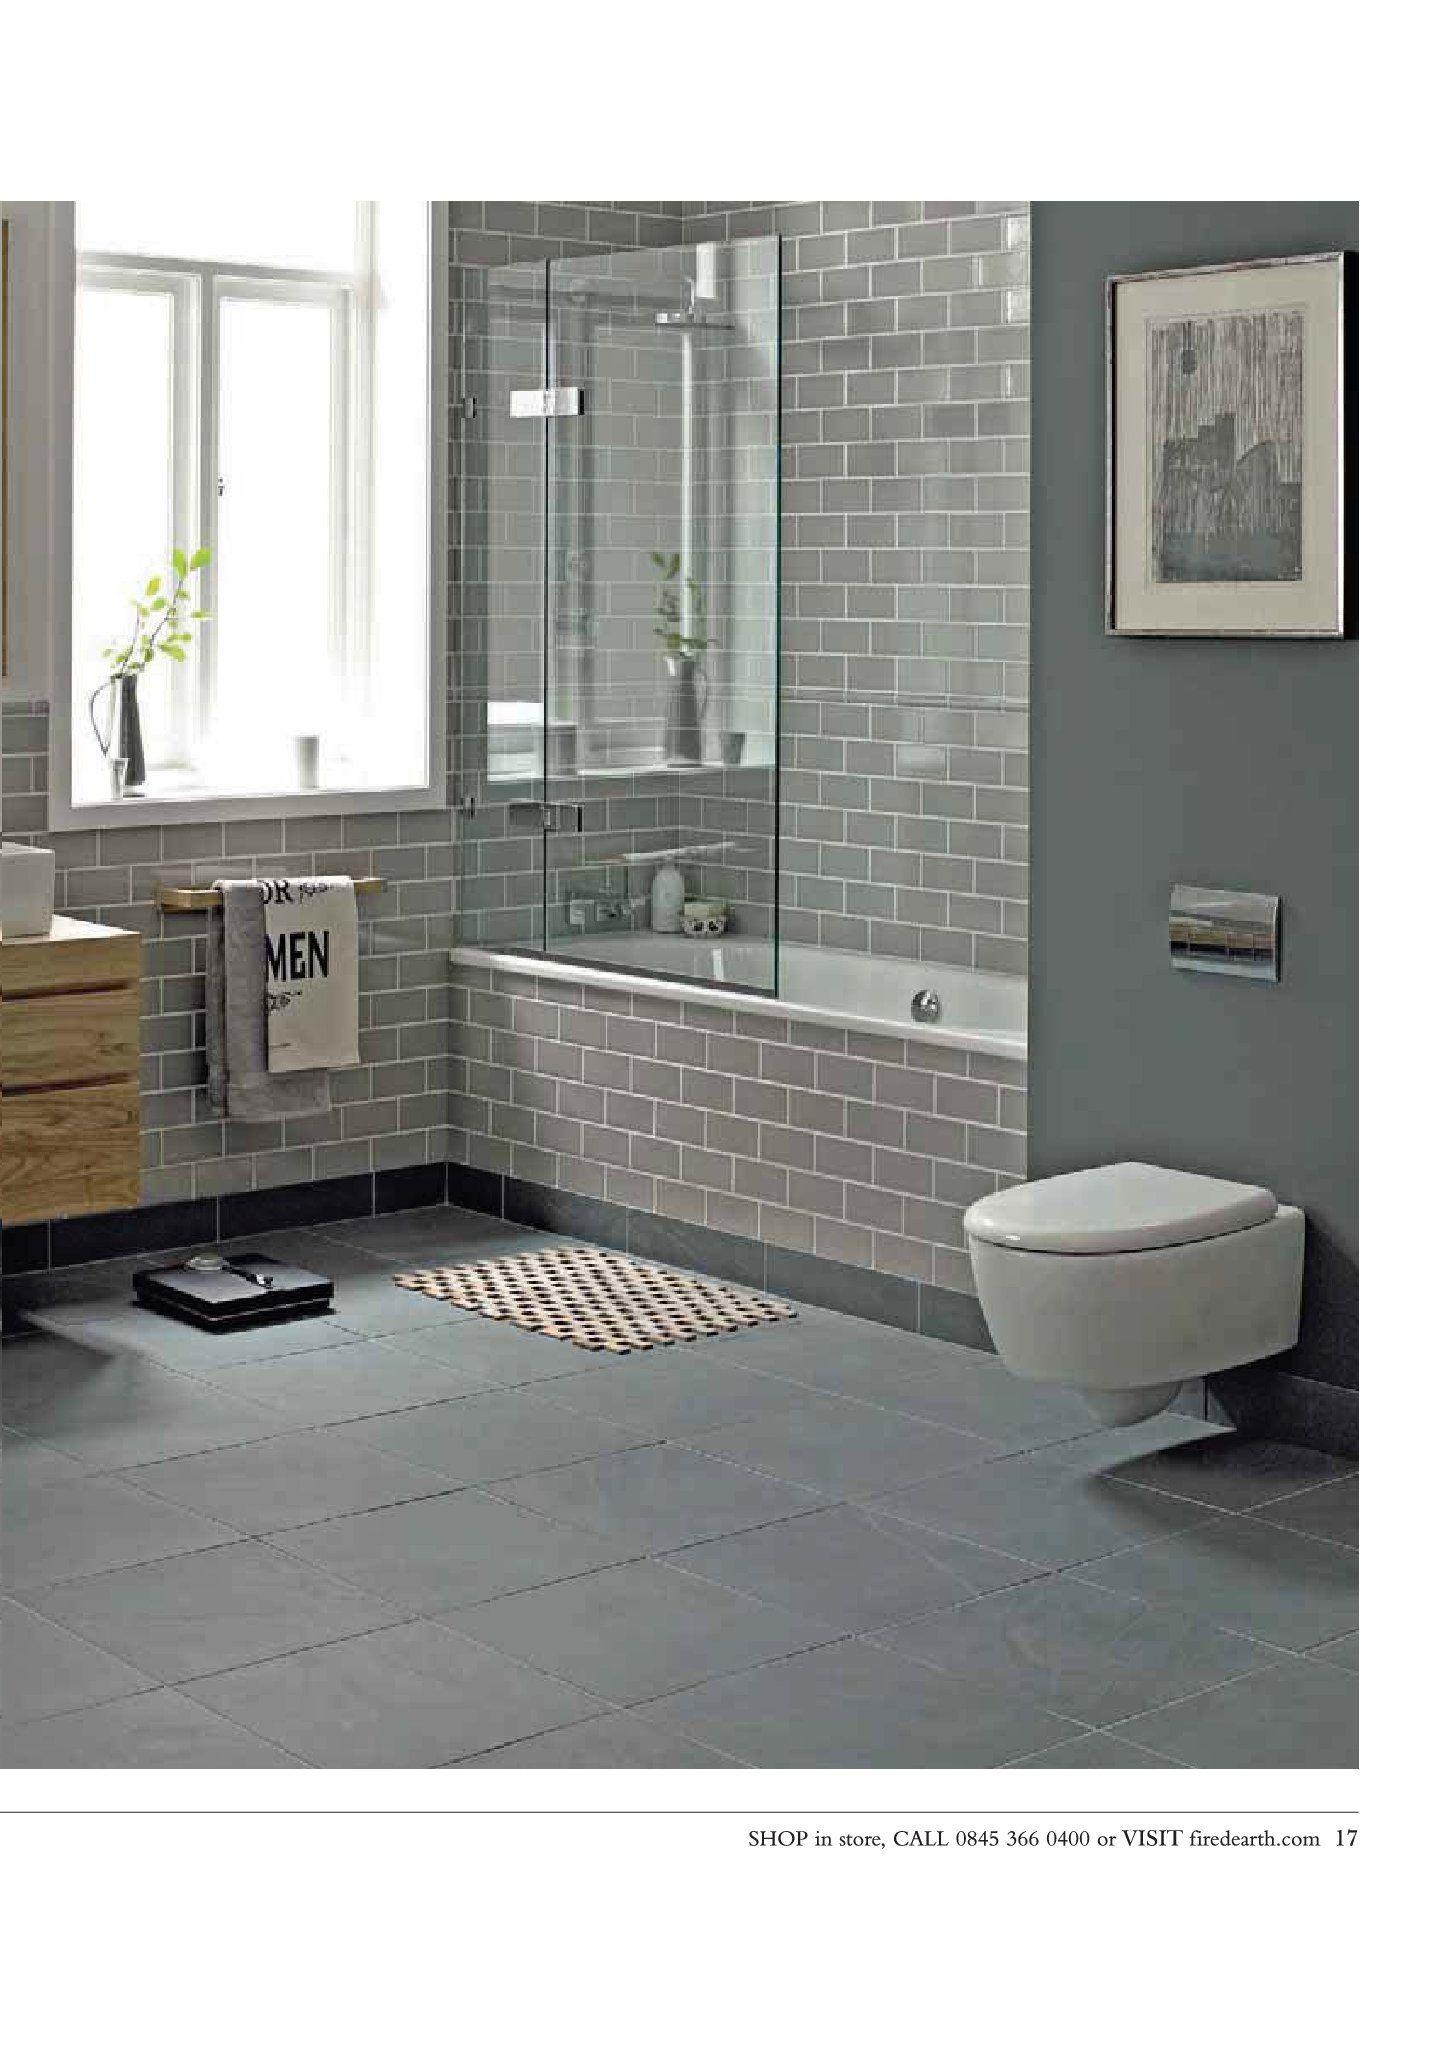 Gray Bathroom Perfect Sanctuary Retro Metro Holland Park Tiles Slate Floor Geo Square Basins Logic Built Grey Bathrooms Bathroom Design Bathroom Plans